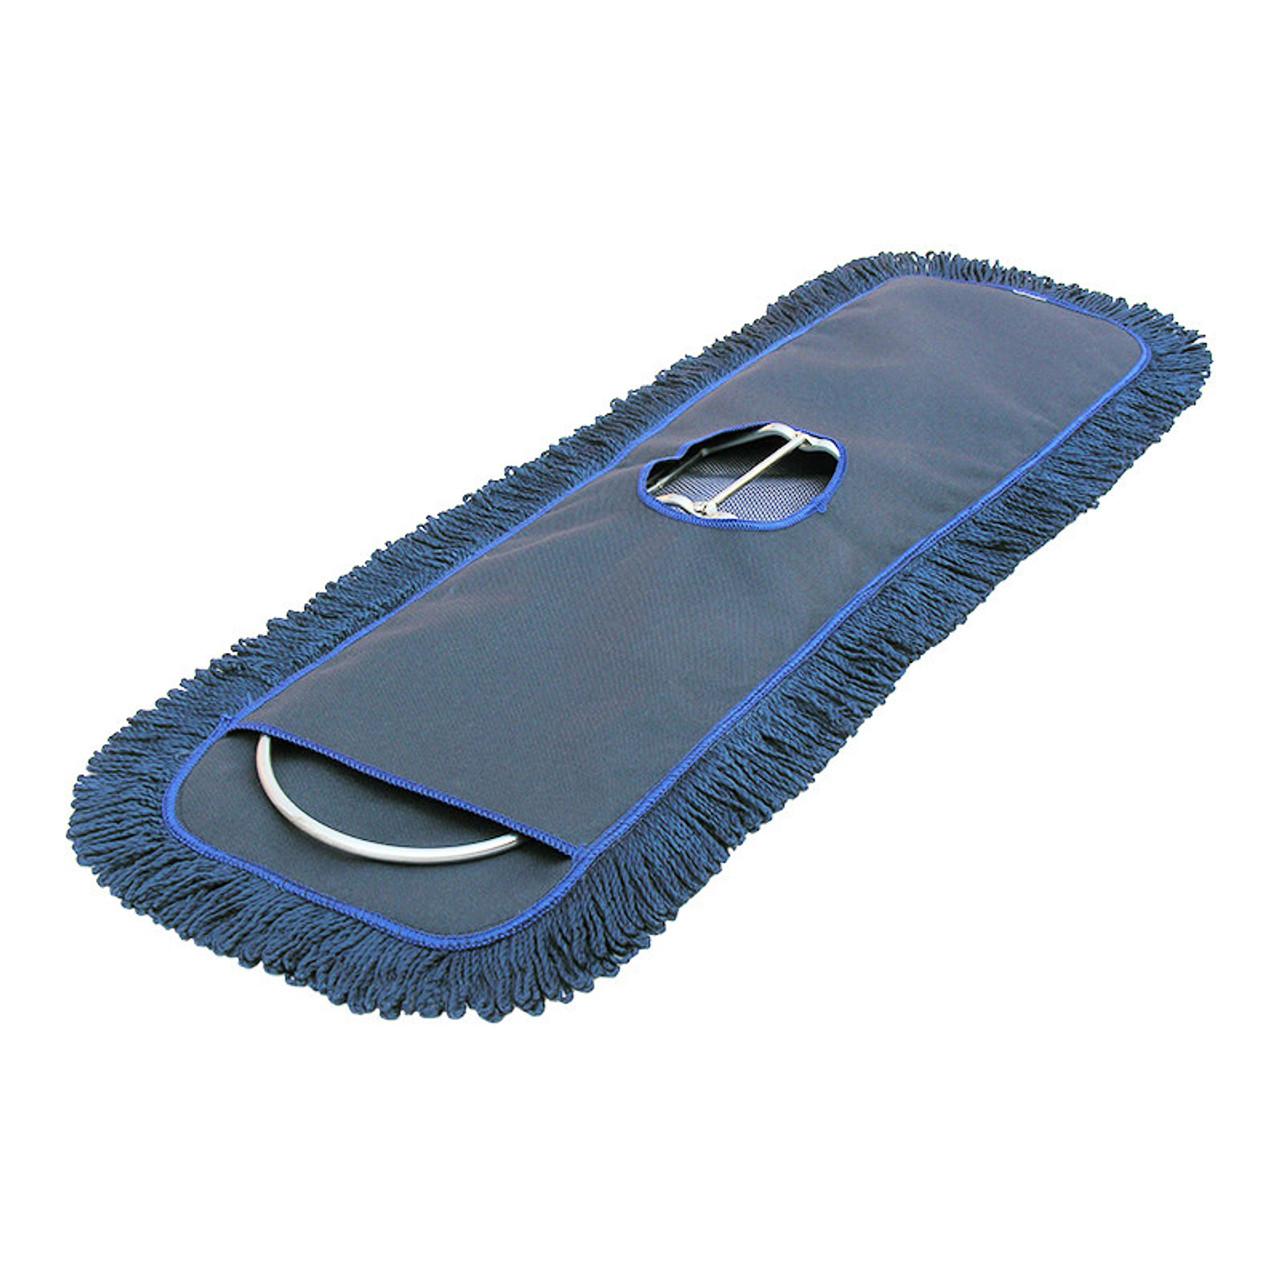 "The MaxiPlus Microfiber Dust Mop Fits 5"" Wide Dust Mop Frame."